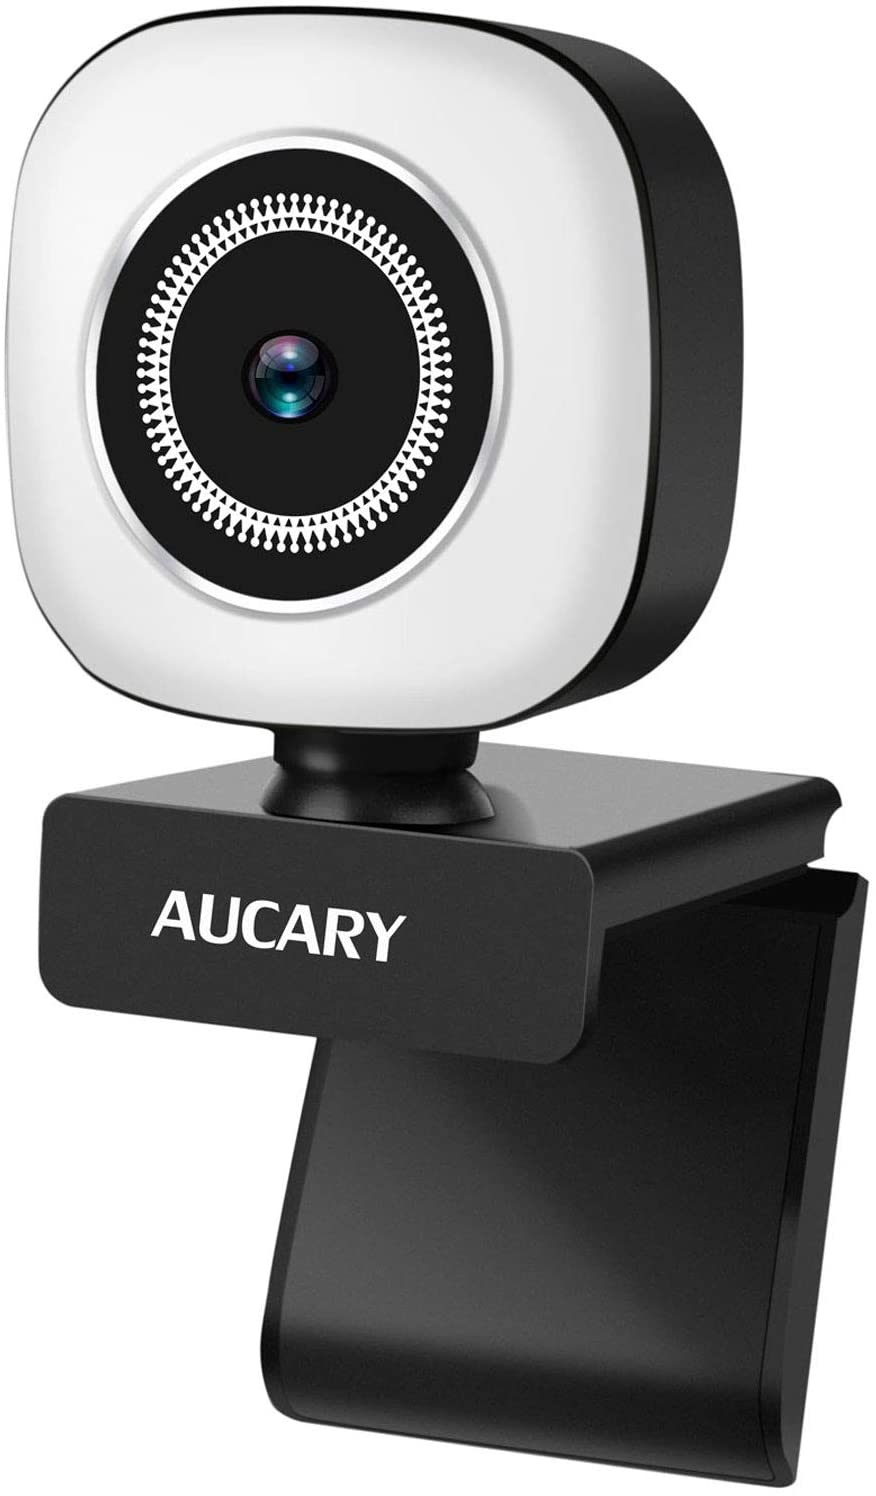 Cámara Web de 1080p con micrófono y anillo de luz incorporado